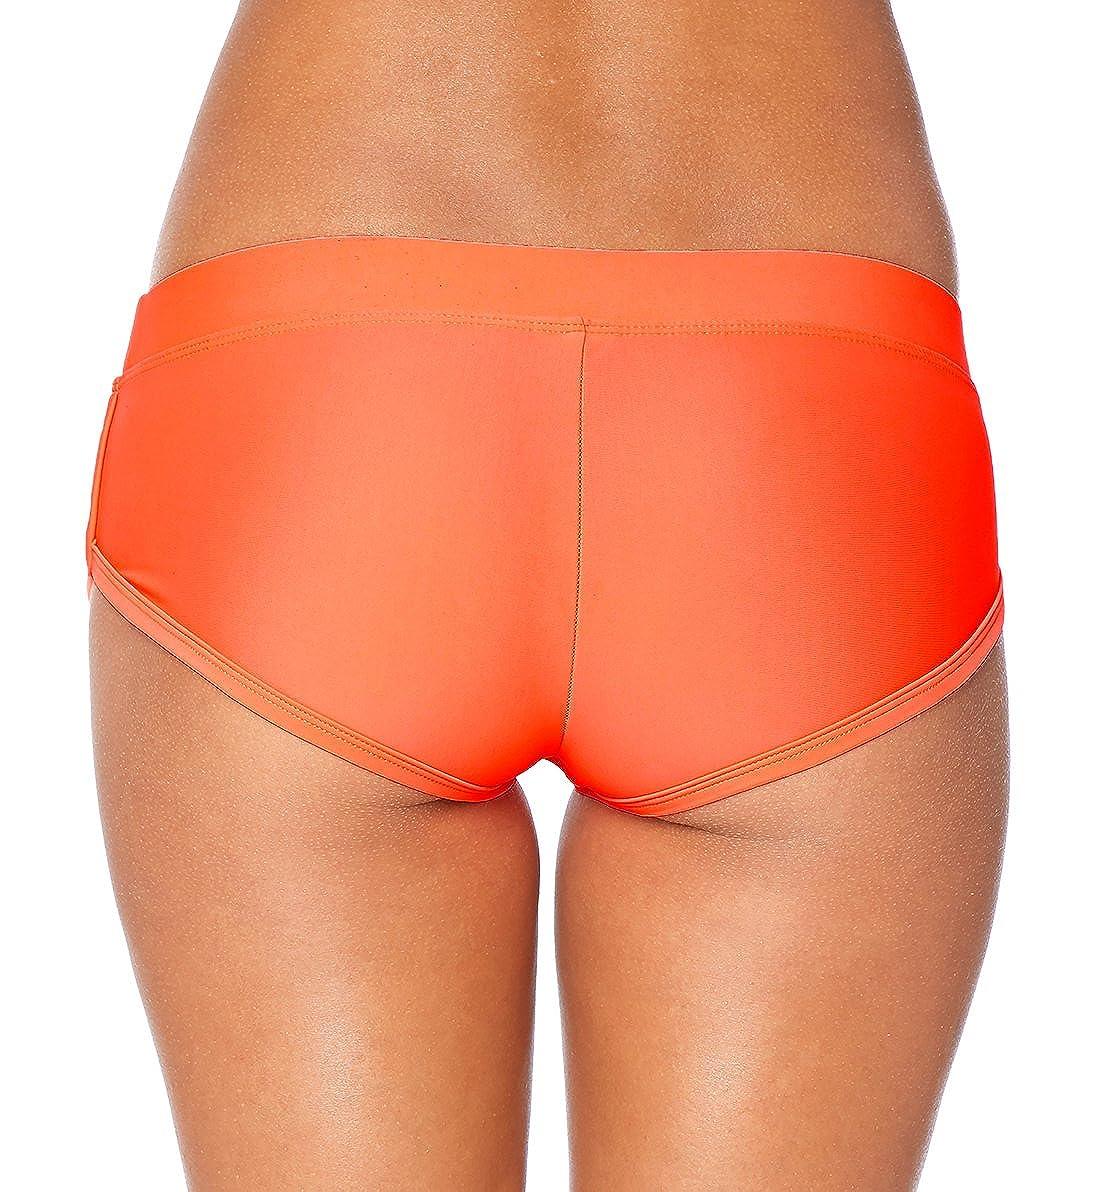 ef79f83b7676c Body Glove Womens Smoothies Sidekick Solid Sporty Bikini Bottom Swimsuit  Short Body Glove Juniors Swimwear 3950640